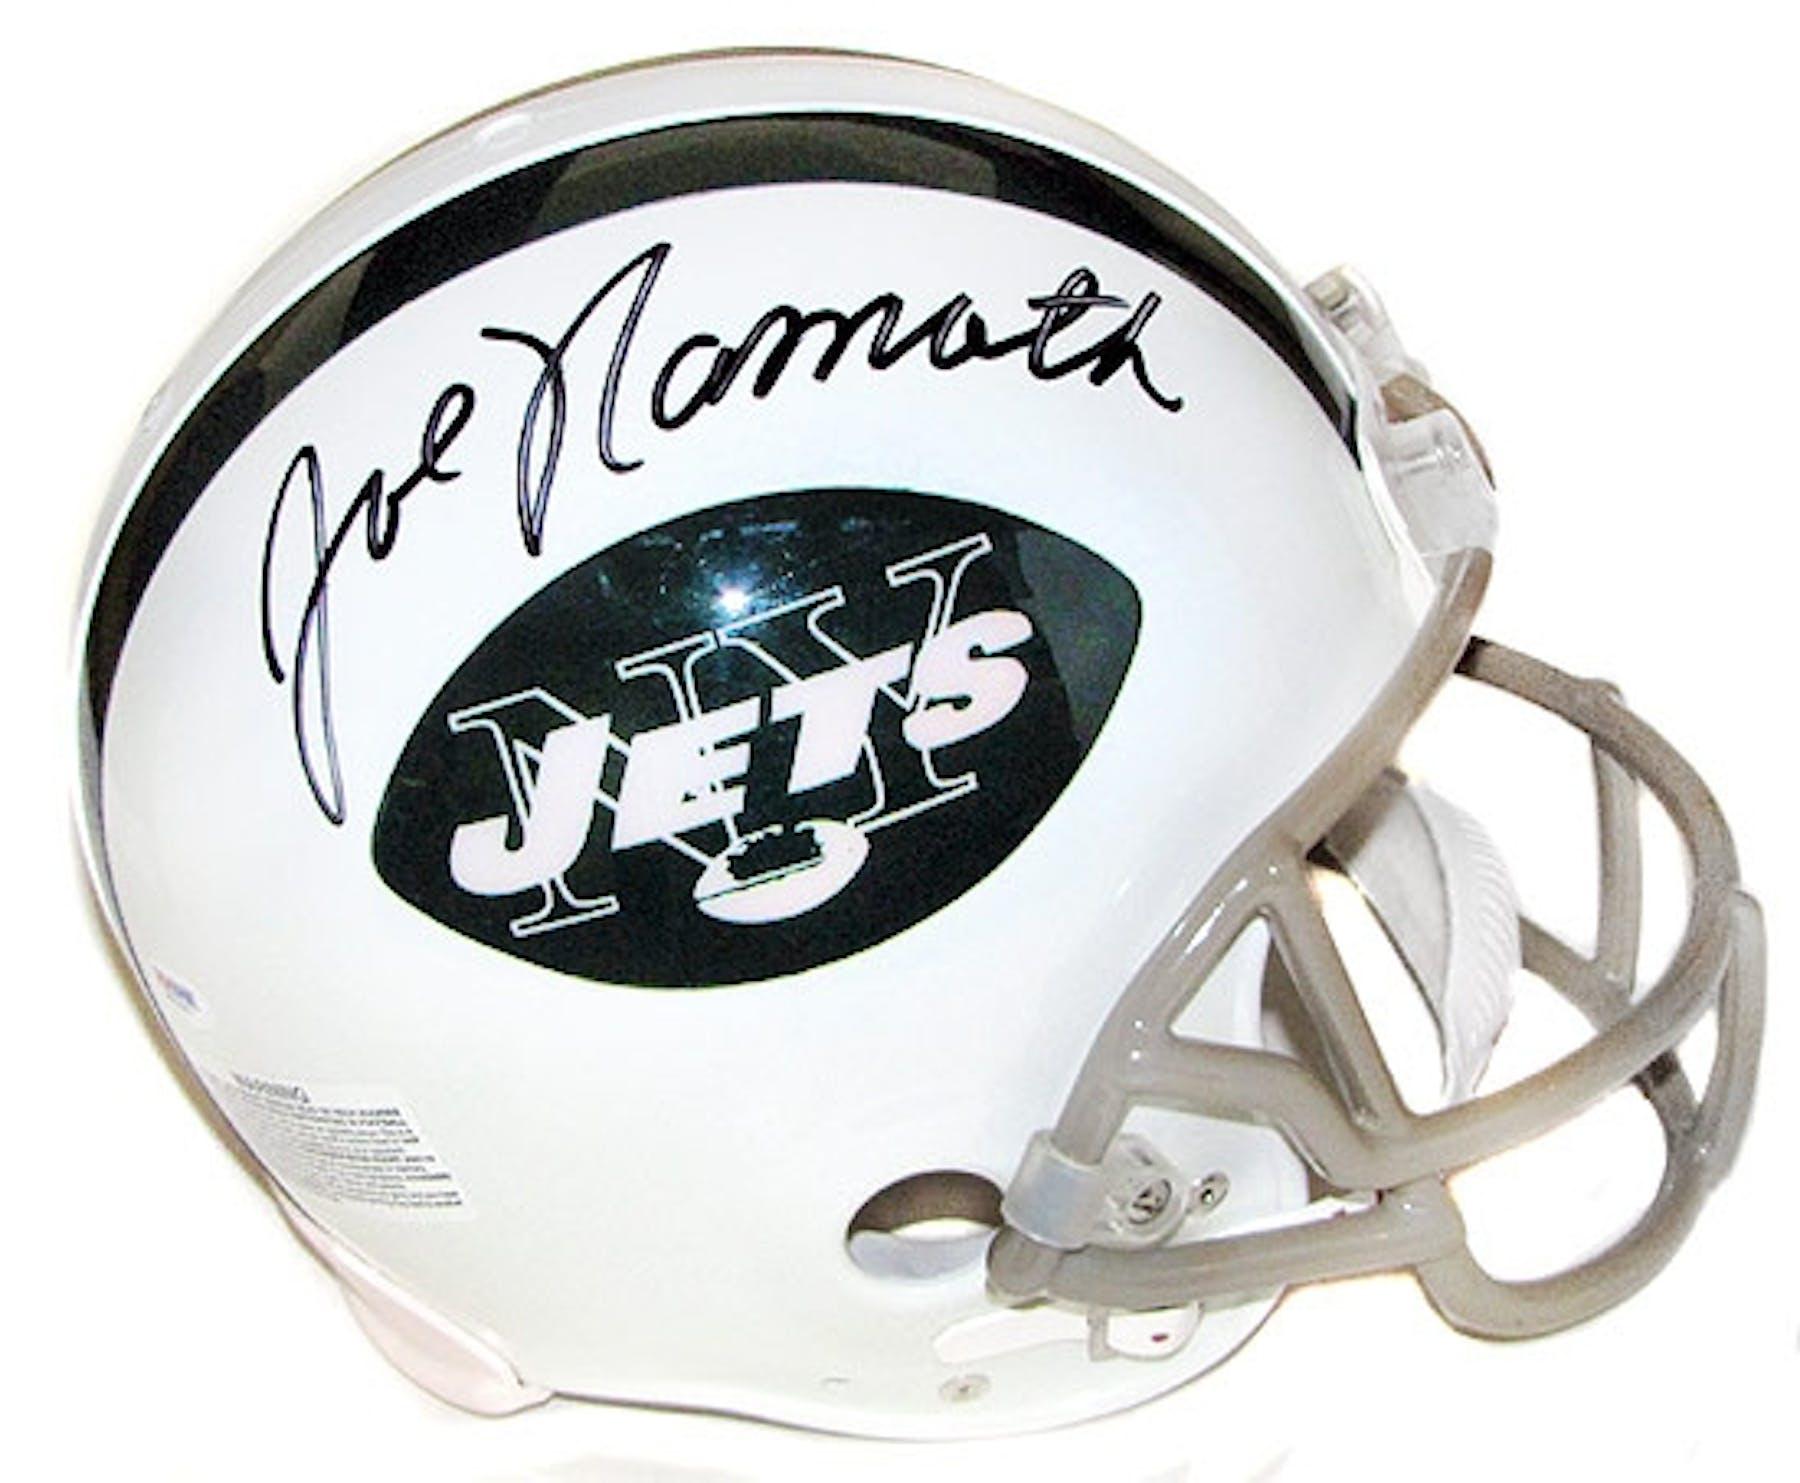 Joe Namath Autographed New York Jets Authentic Full Size Football ... e71506a0f